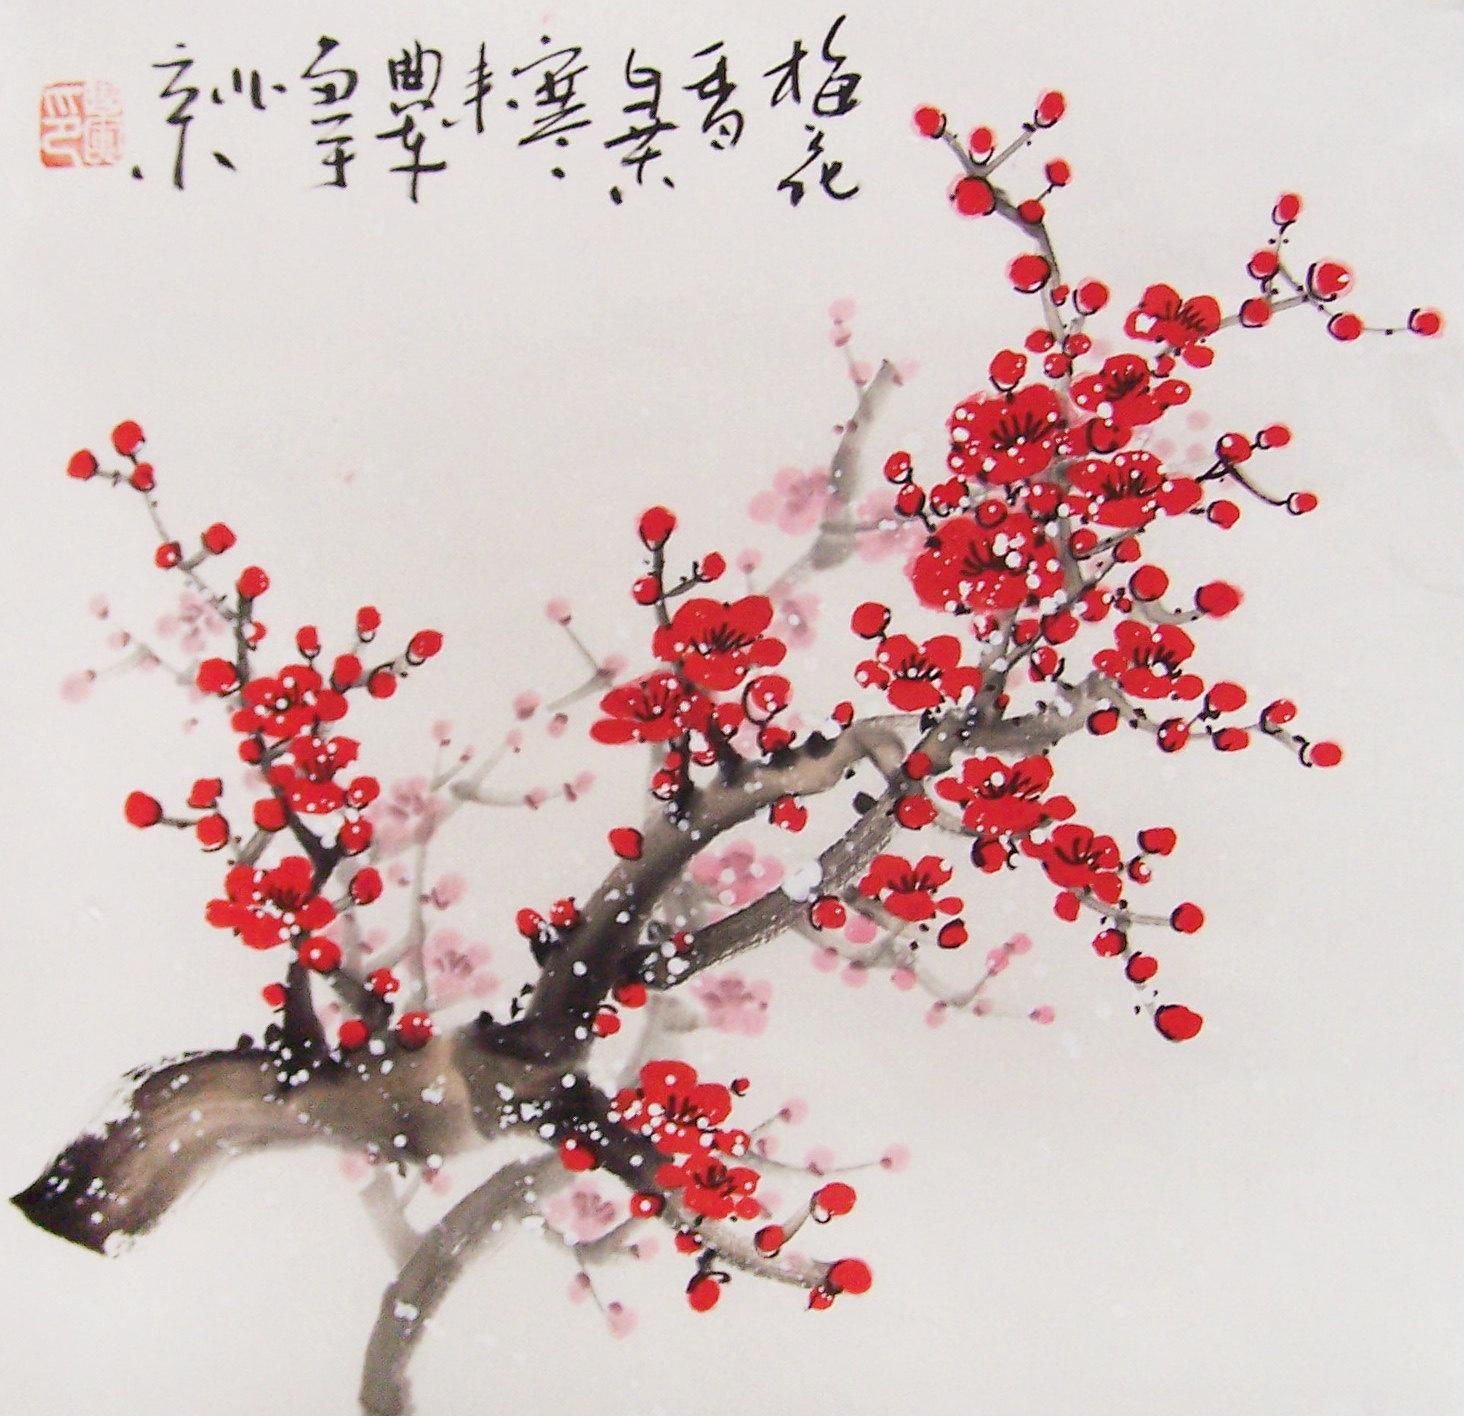 Drawn sakura blossom red Painting Blossom  oriental Cherry